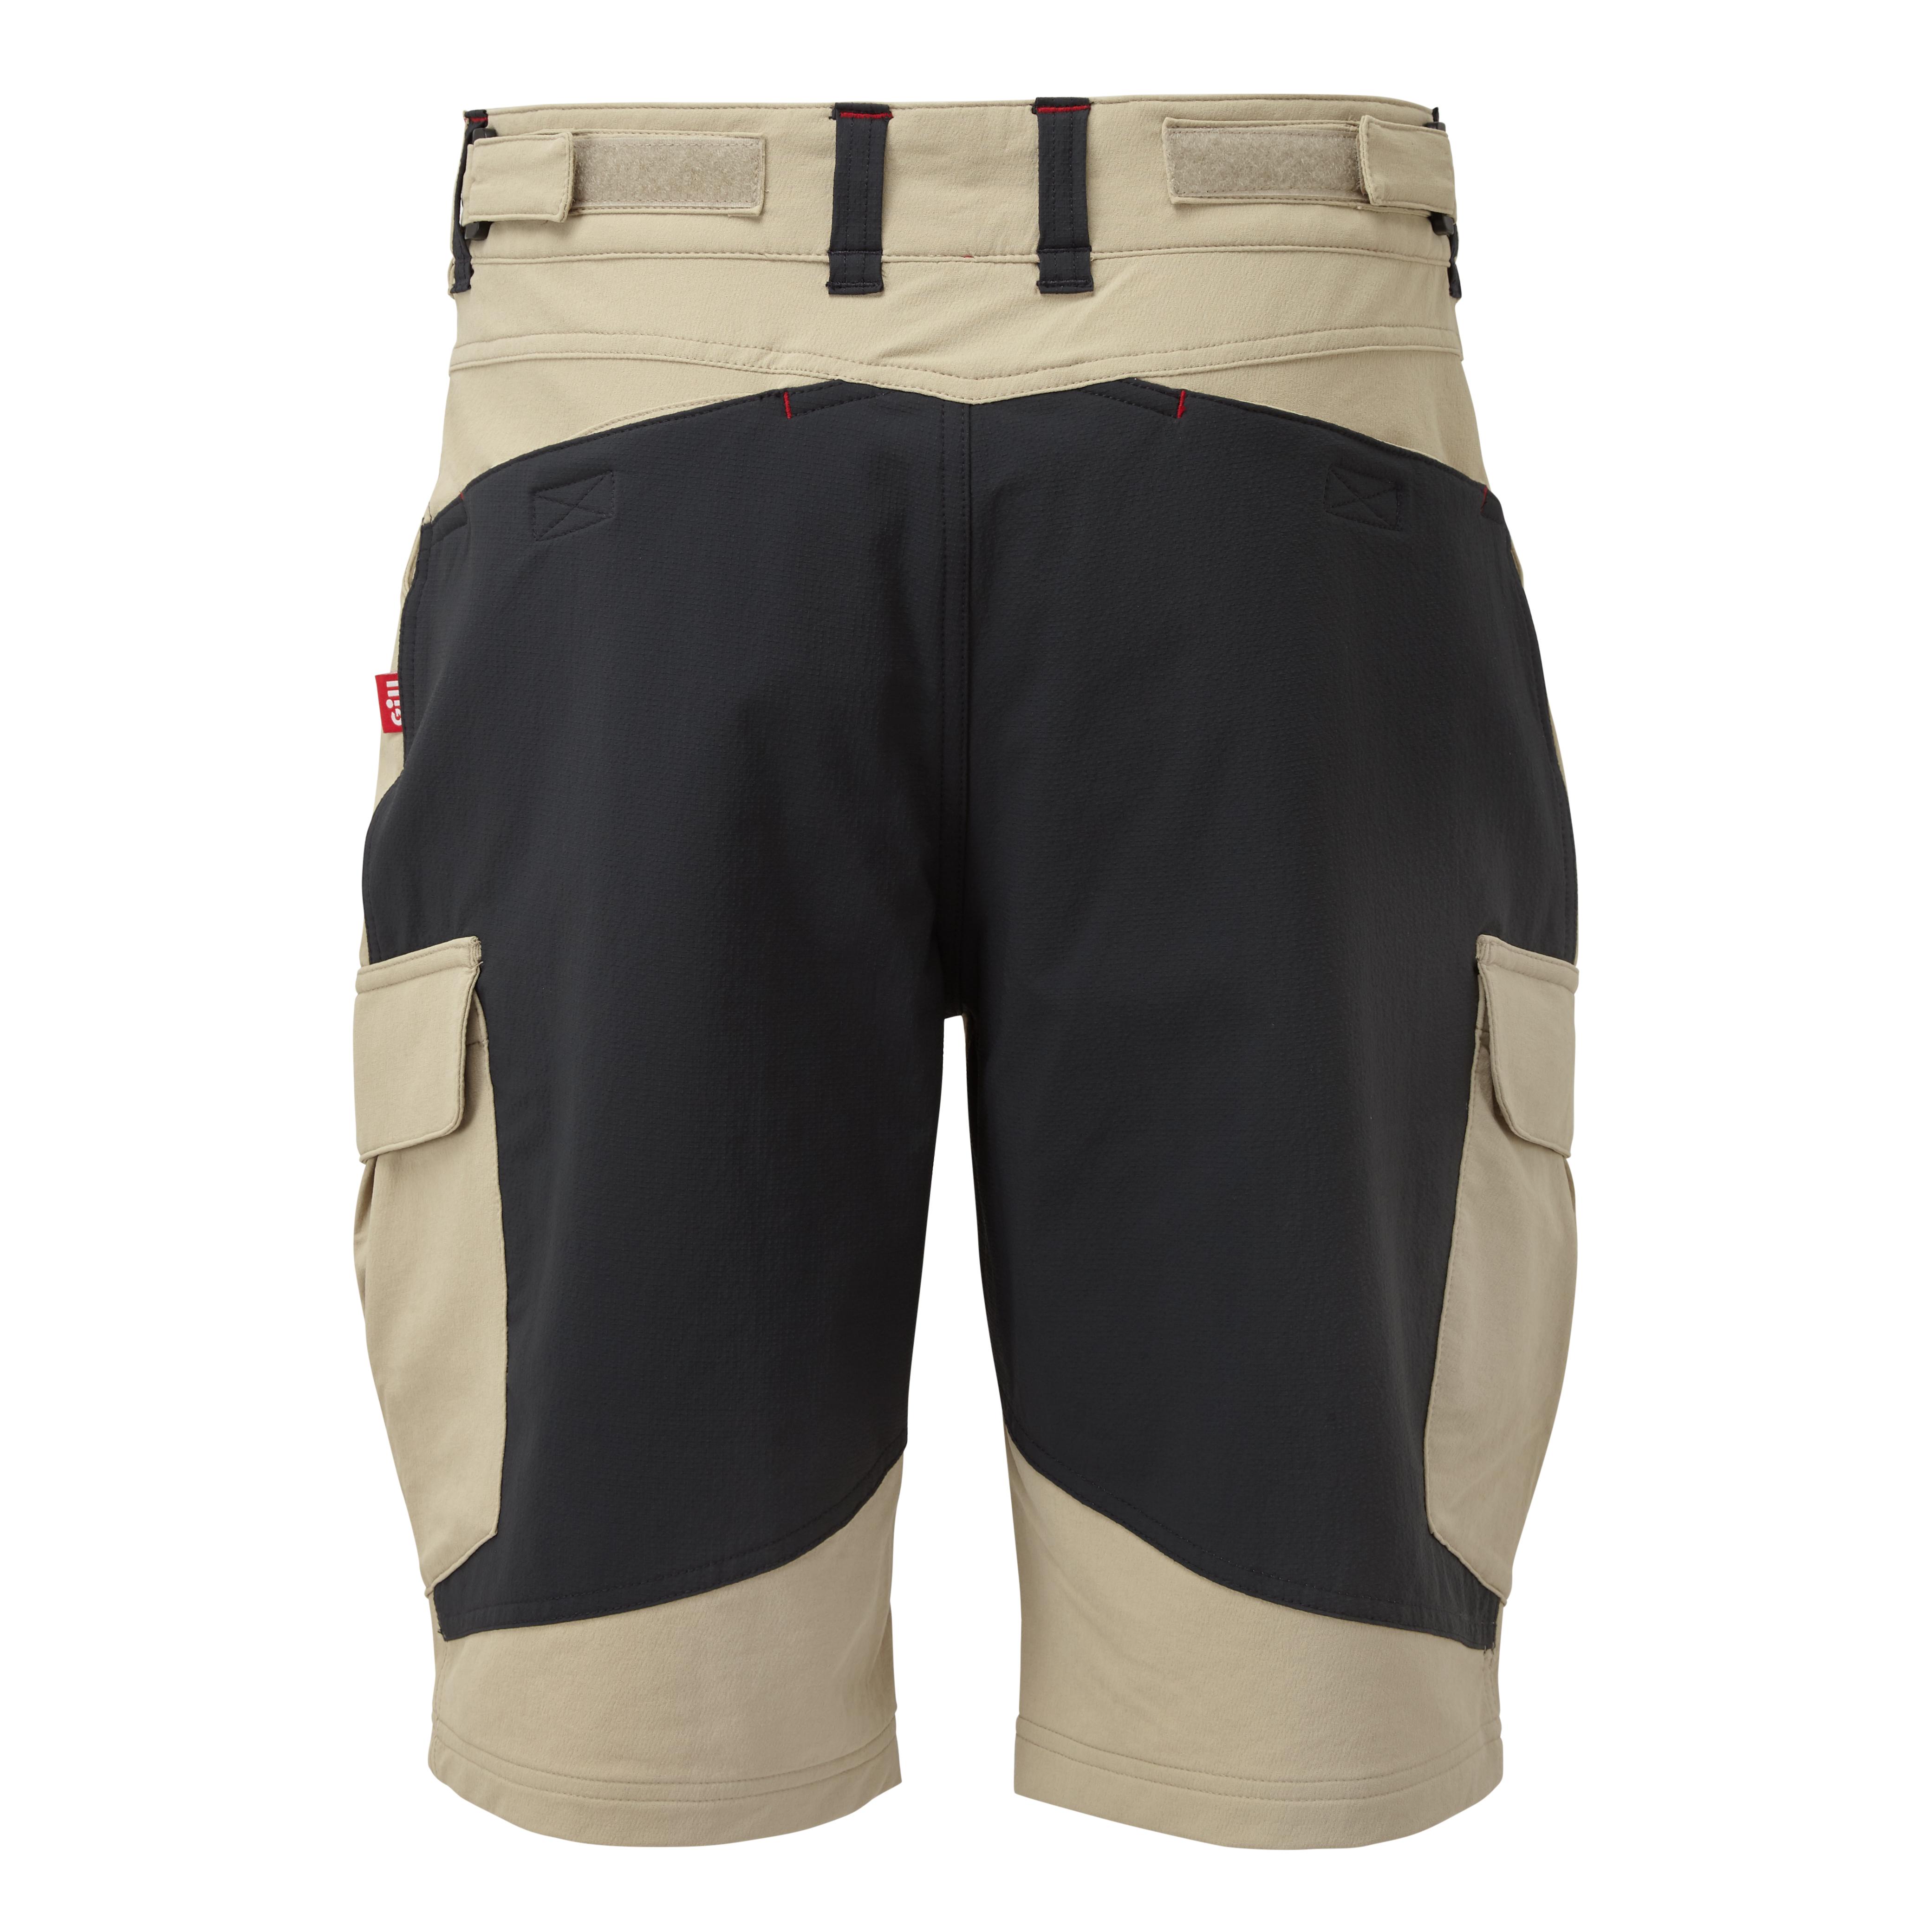 Men's UV Tec Pro Shorts - UV013-KHA01-2.jpg